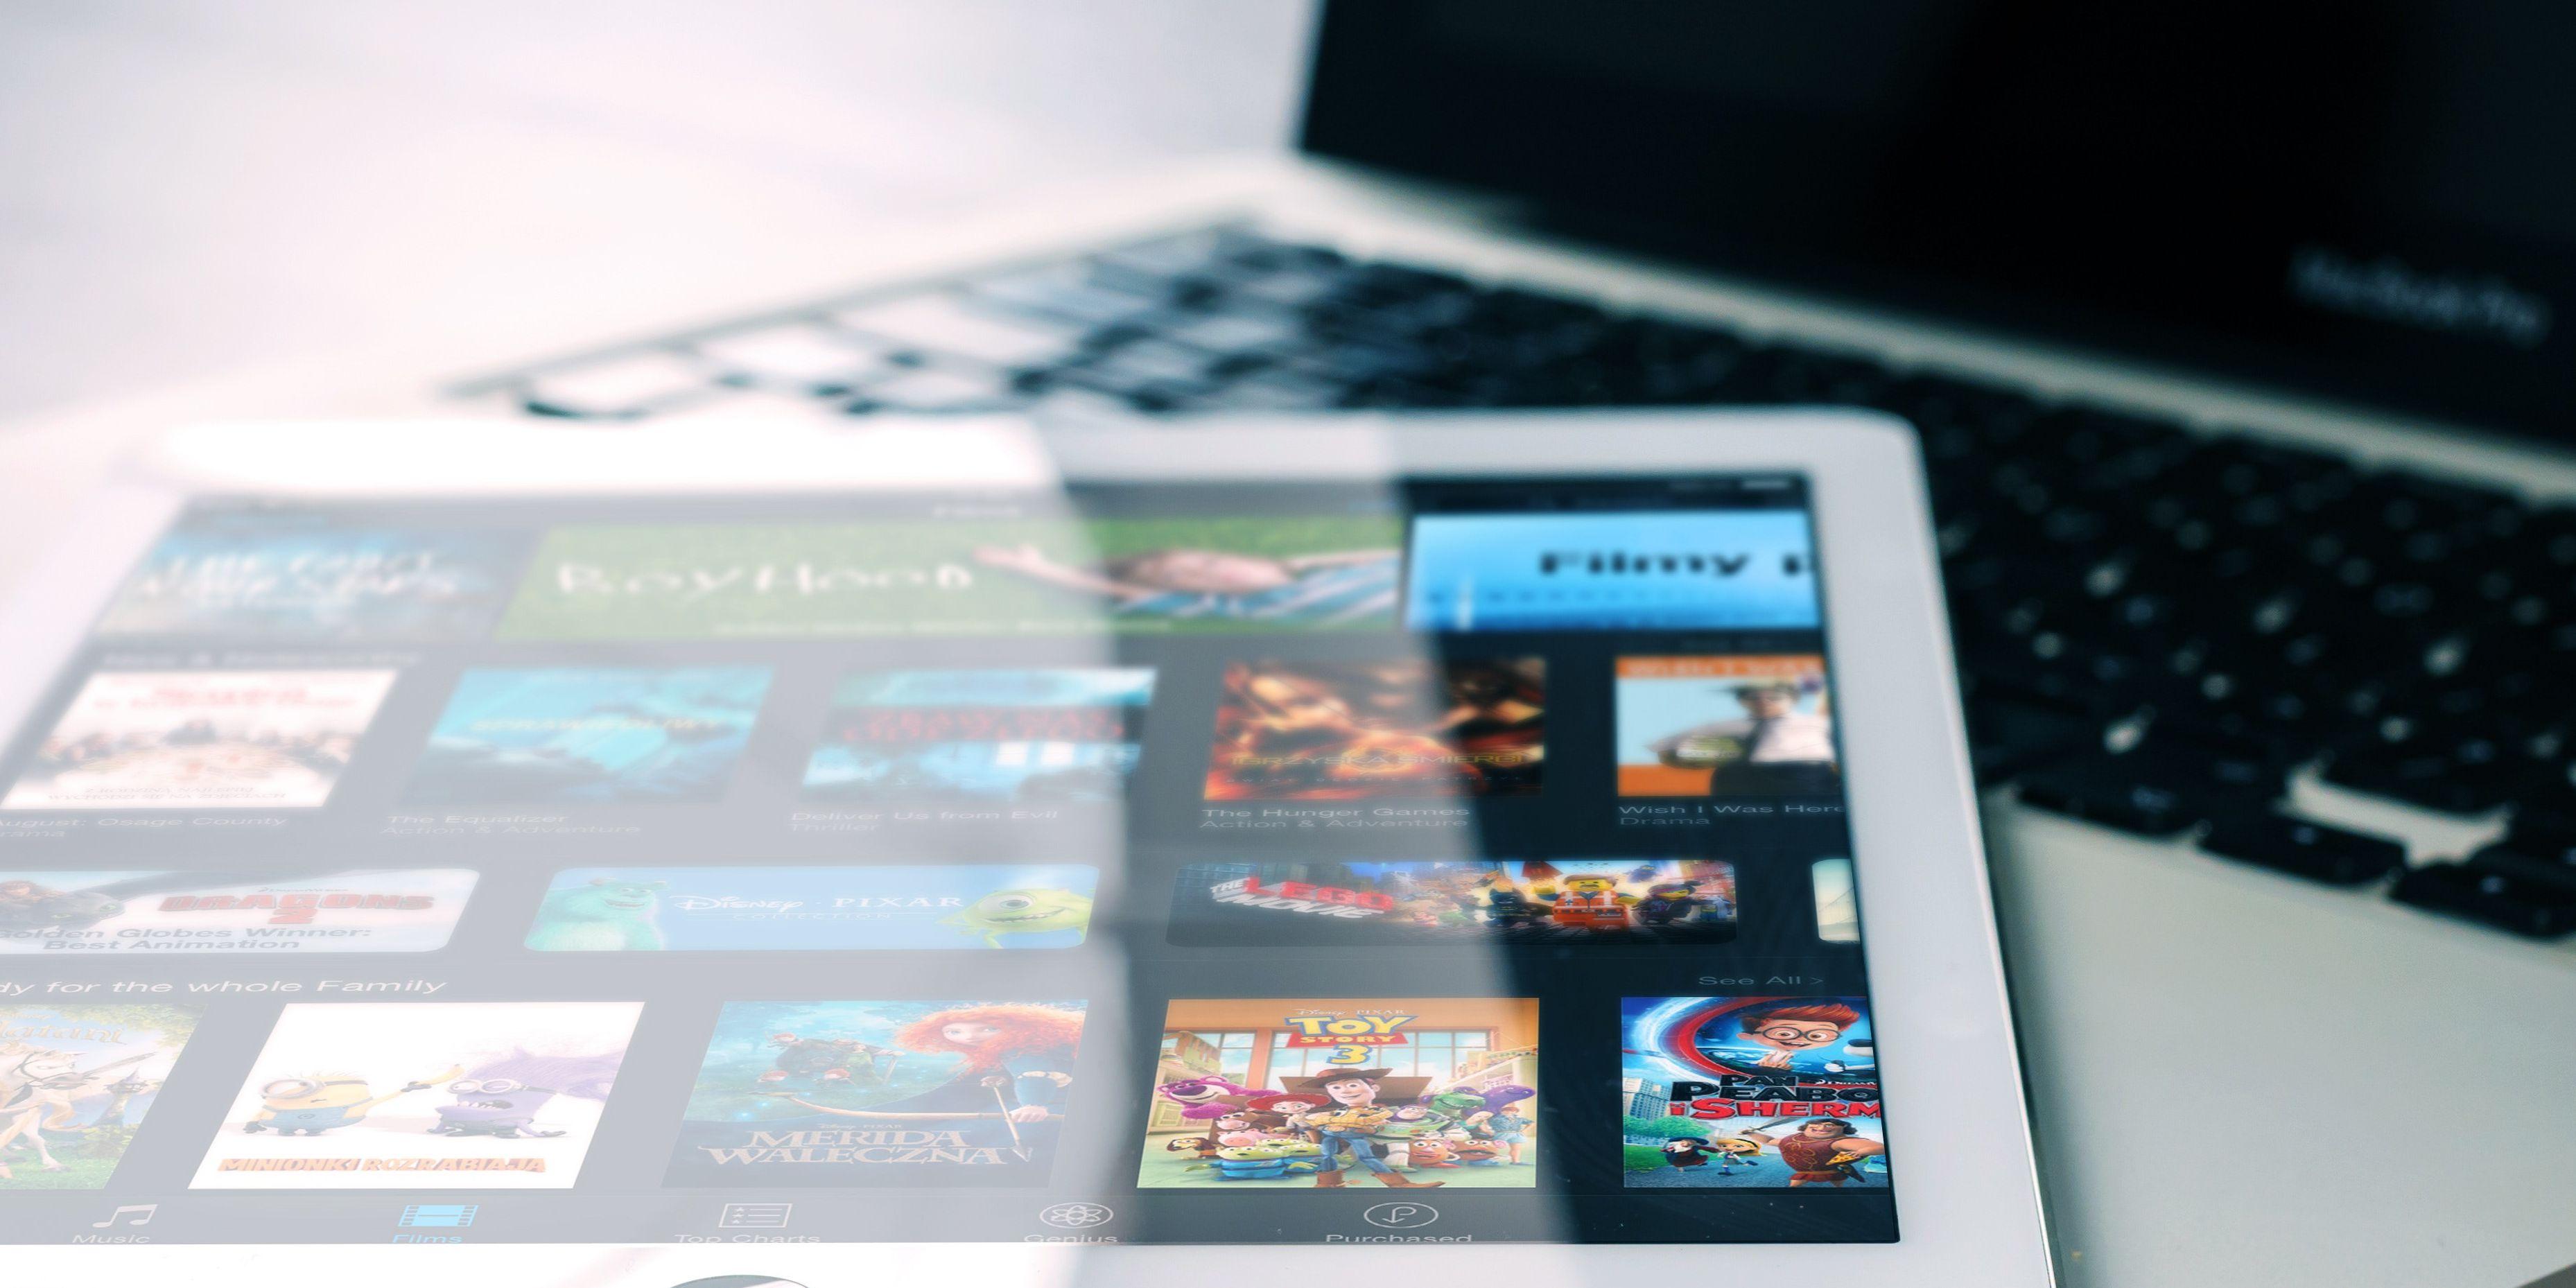 Rural Georgians hope to finally see faster Internet speeds